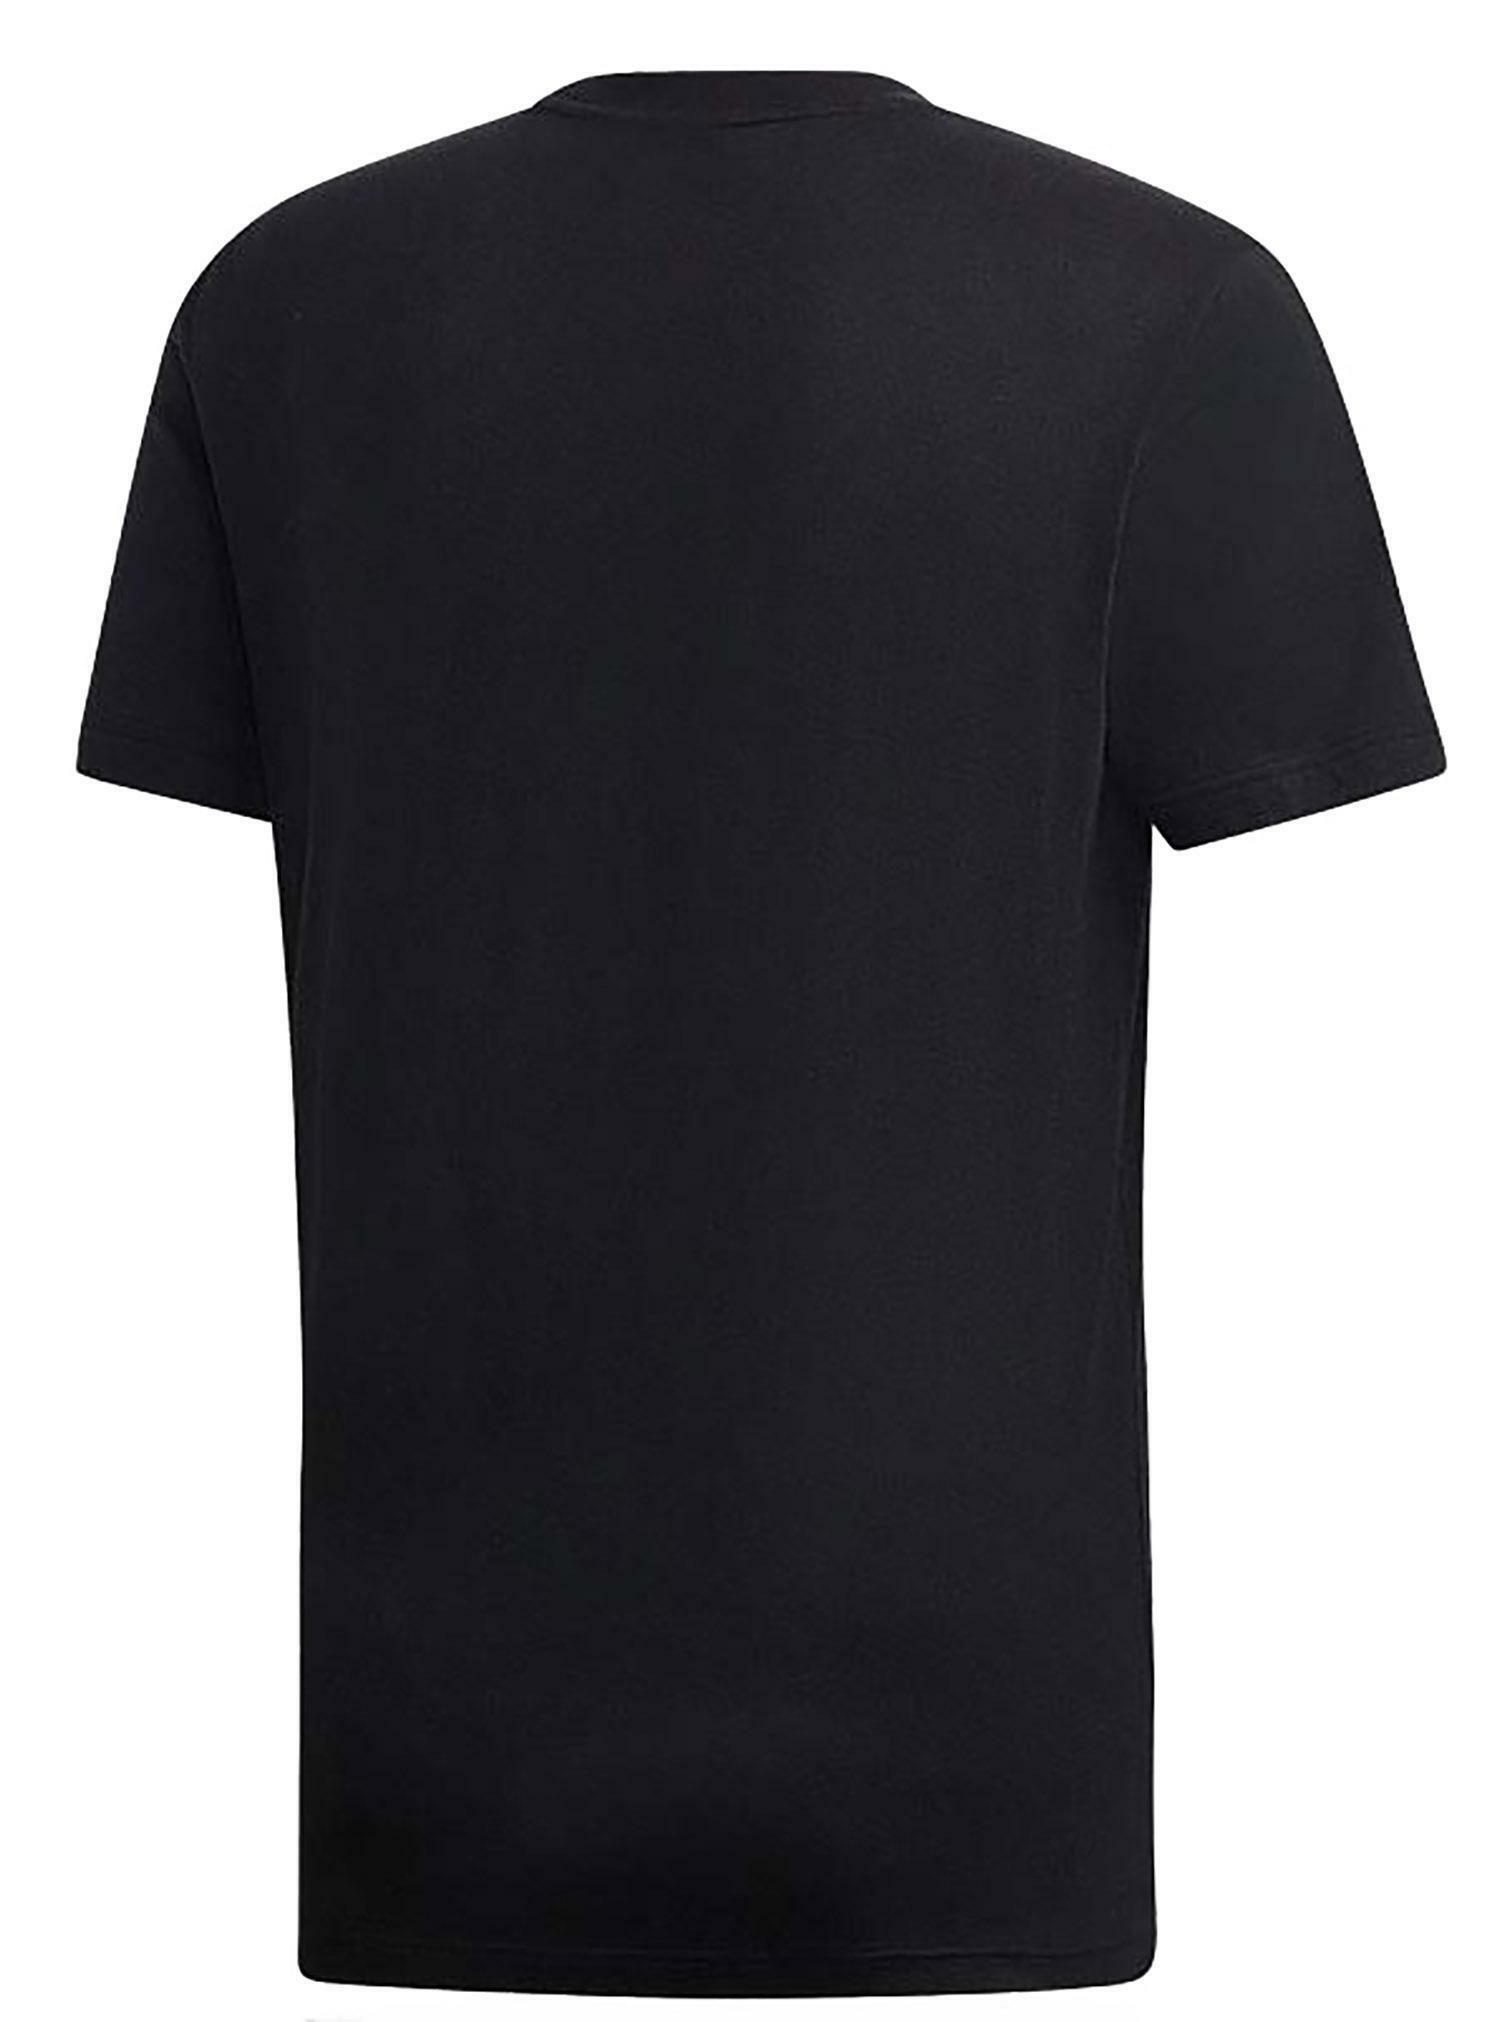 adidas mh bos tee t-shirt uomo nera dt9933